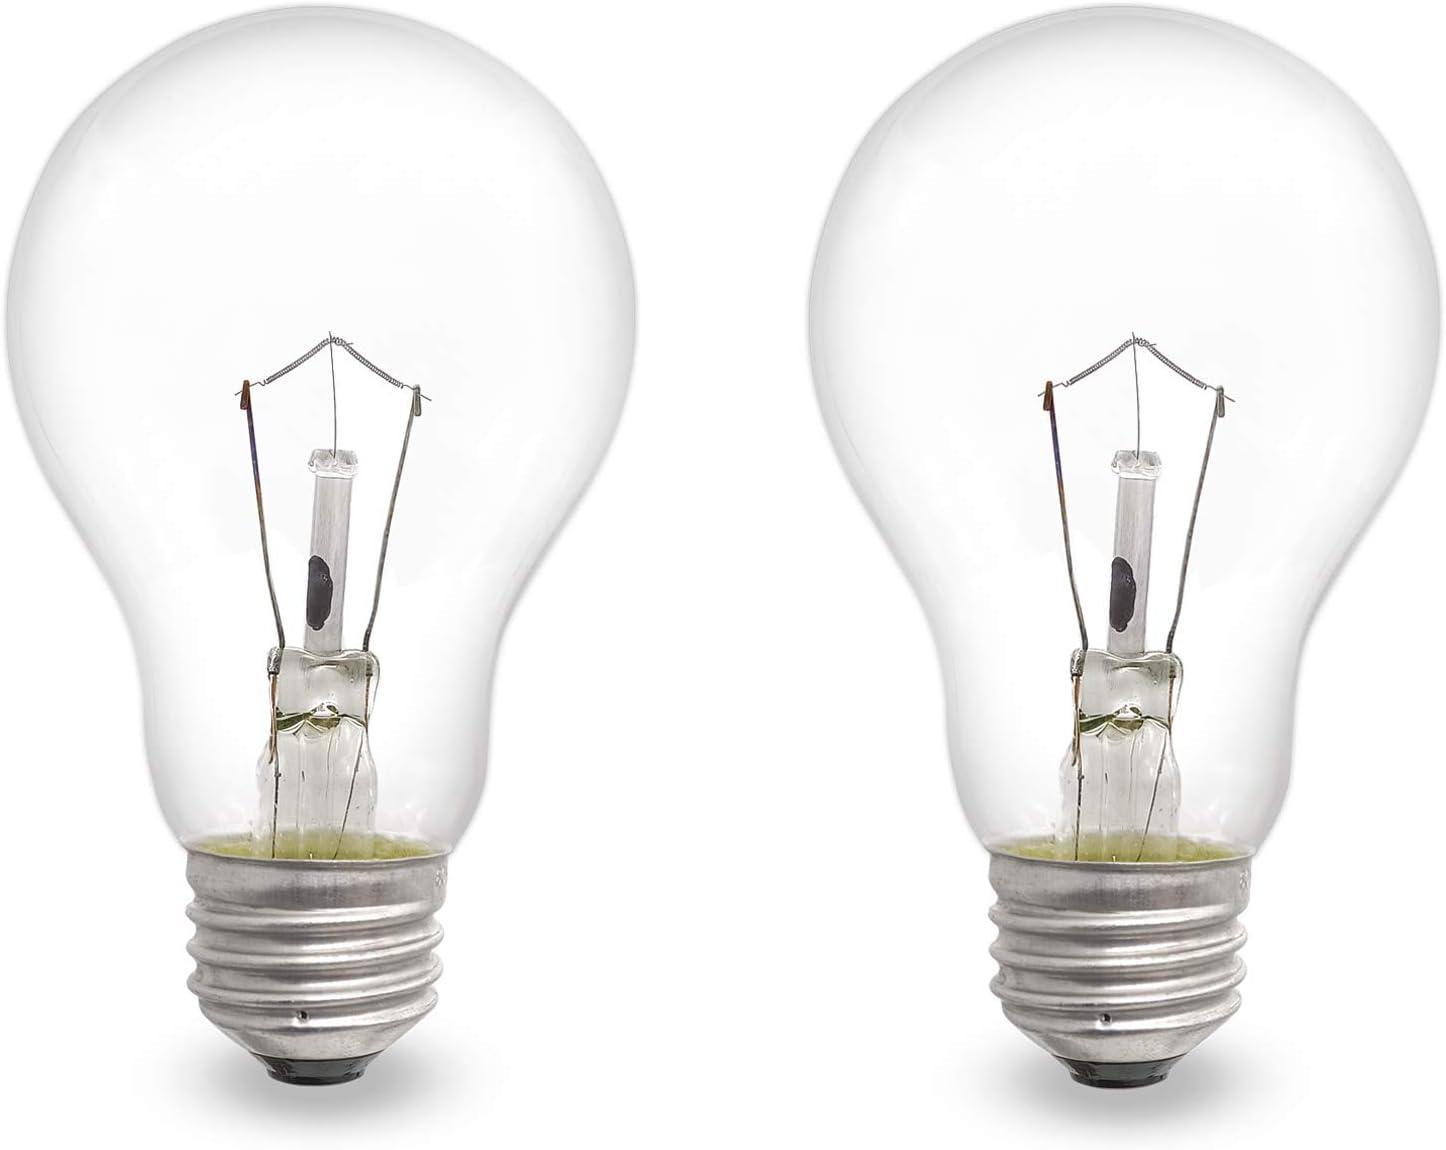 Appliance Light Bulbs 60 Watt A19, Dimmable A19 Ceiling Fan Light Bulbs, E26/E27 Medium Base, 2700K Warm White Incandescent Bulb, High Temp 110-130 Volt Refrigerator Oven Bulbs, Microwave Light Bulb